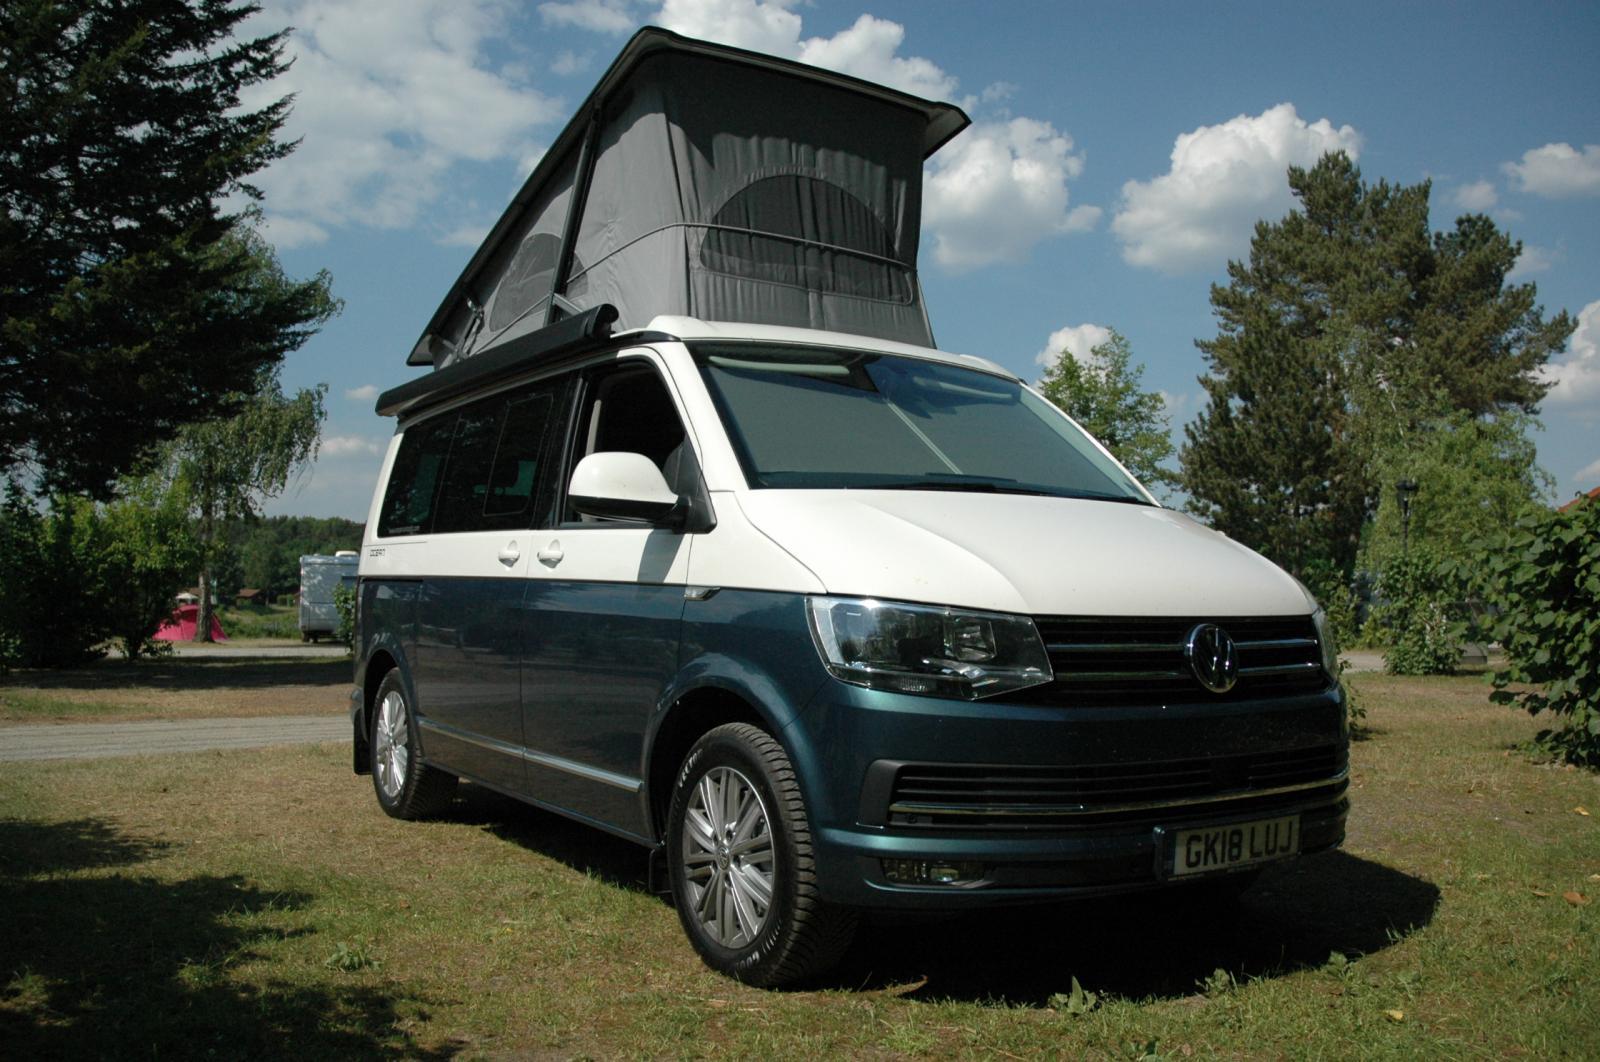 VW California Ocean Camper Van T6 2018 Candy White & Bamboo Green 2 0lt  BiTDi 204 PS 7 Speed DSG Automatic